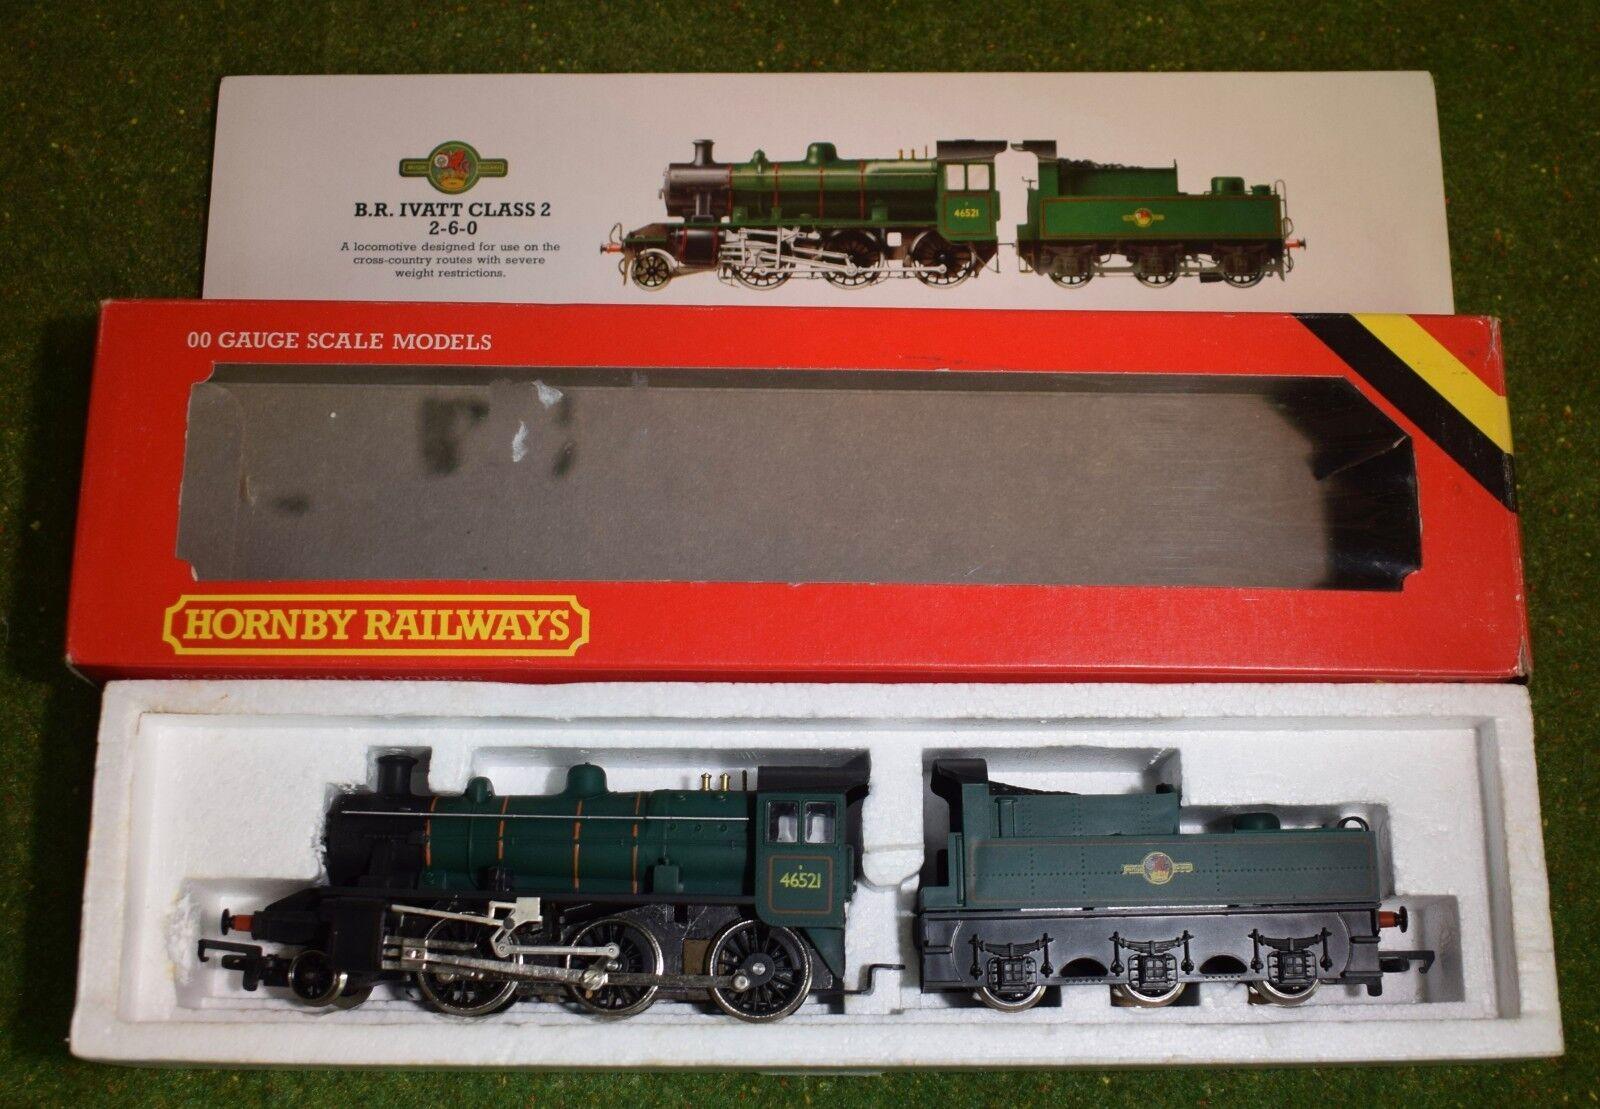 HORNBY i treni RAILWAY OO GAUGE BR 2-6-0 IVATT IVATT IVATT classe 2 12bf9b